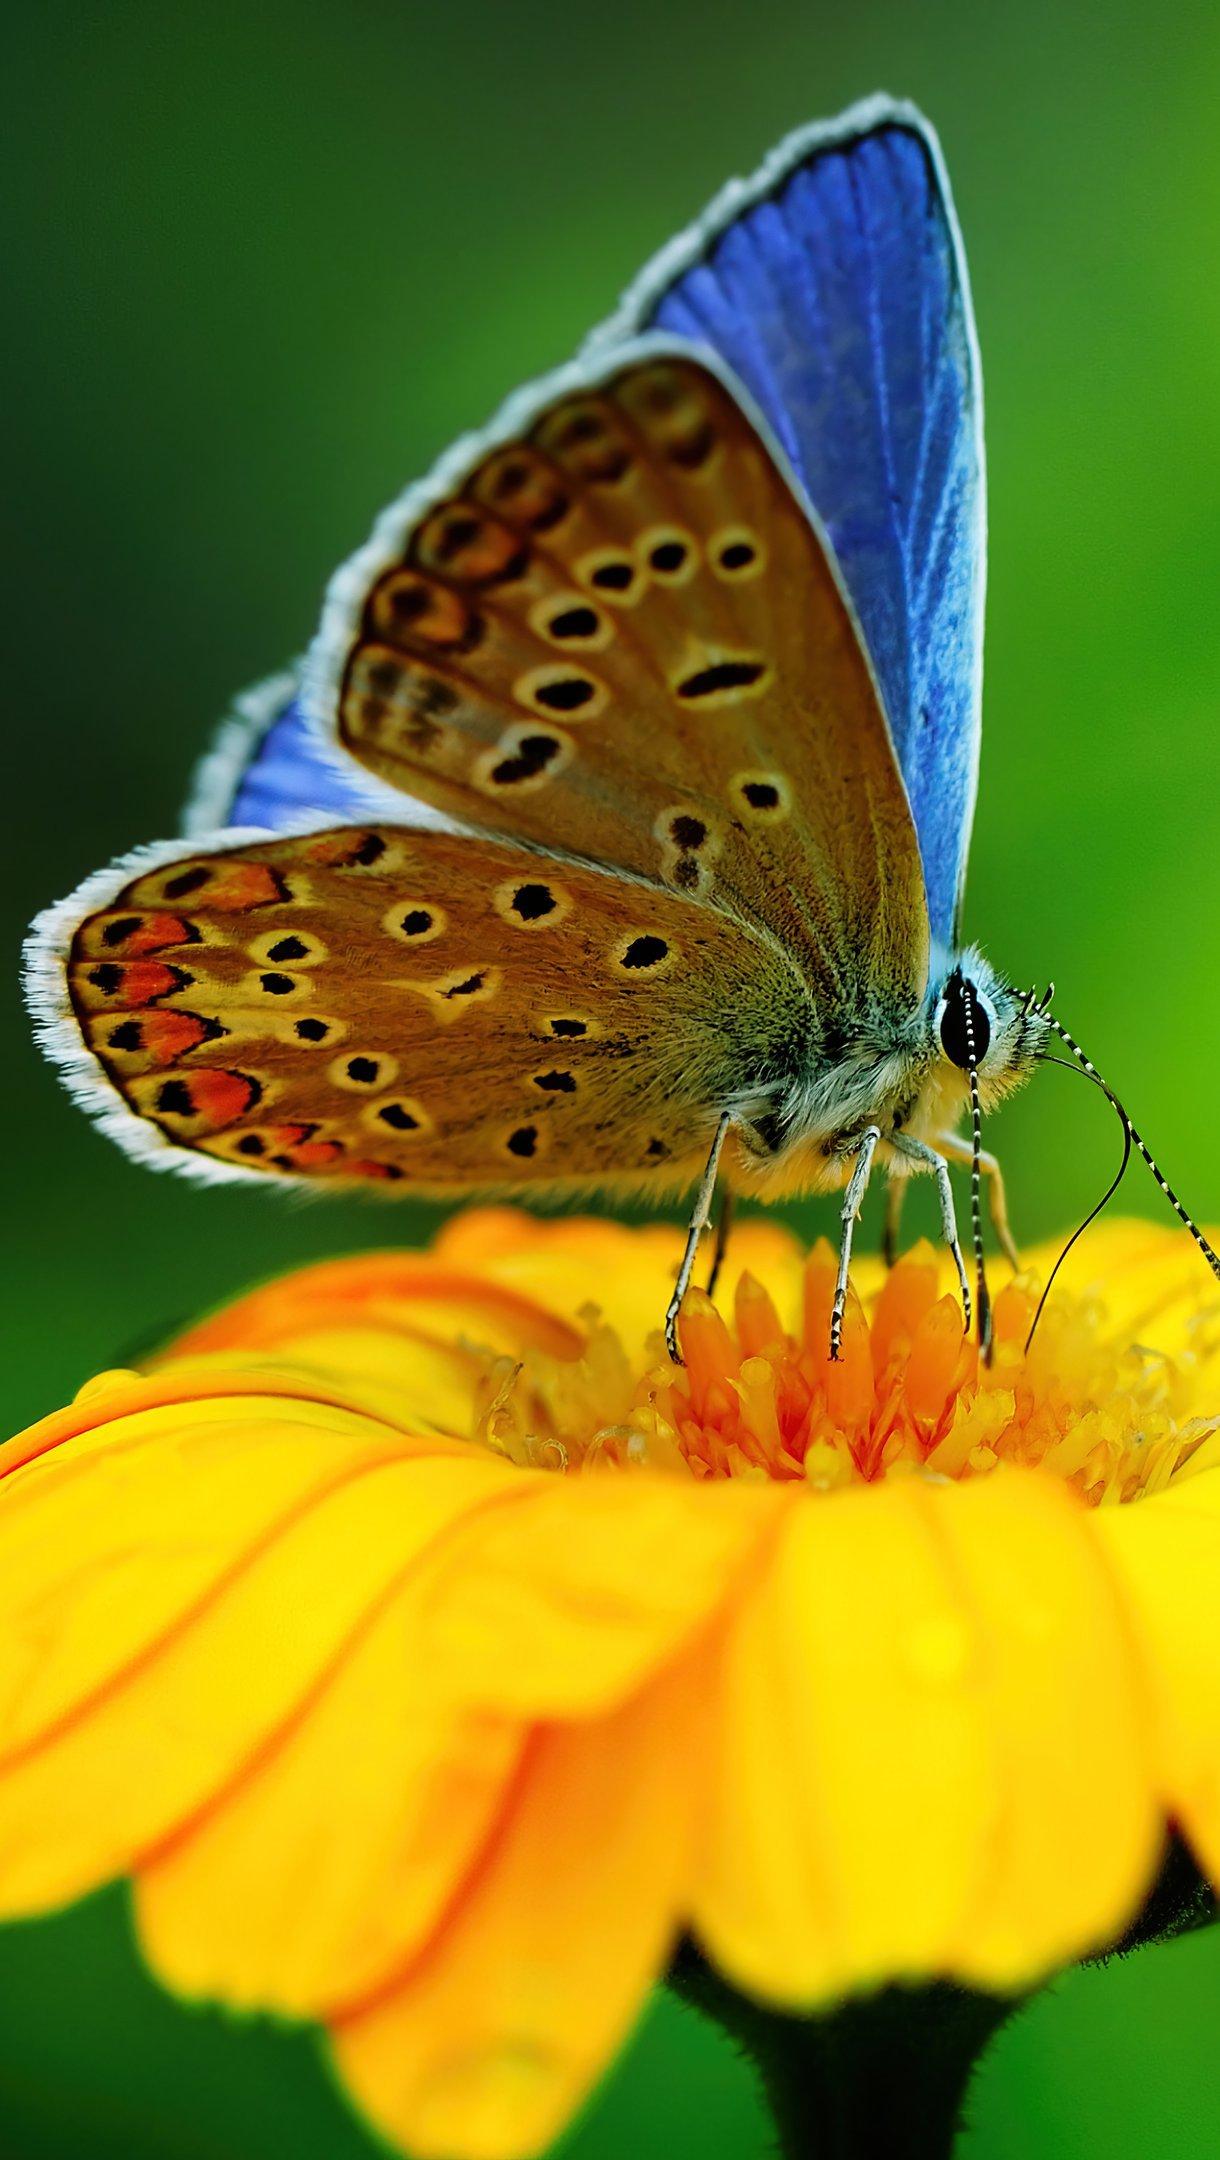 Fondos de pantalla Mariposa sobre flor amarilla Vertical